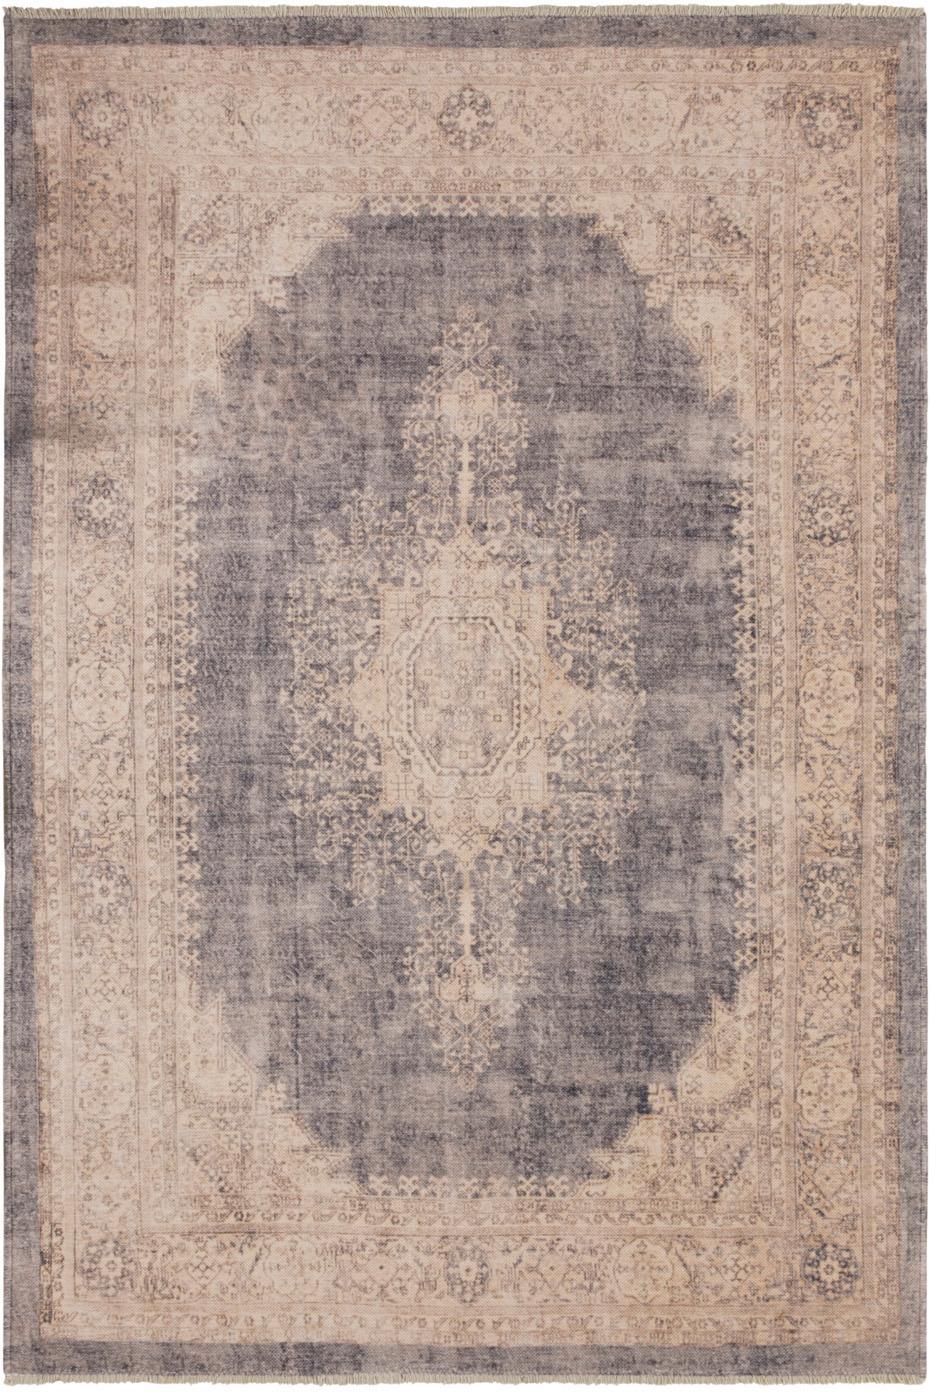 Vloerkleed Maschad Chora in vintage stijl met franjes, Polyester, Crèmekleurig, taupe, B 120 x L 170 cm (maat S)